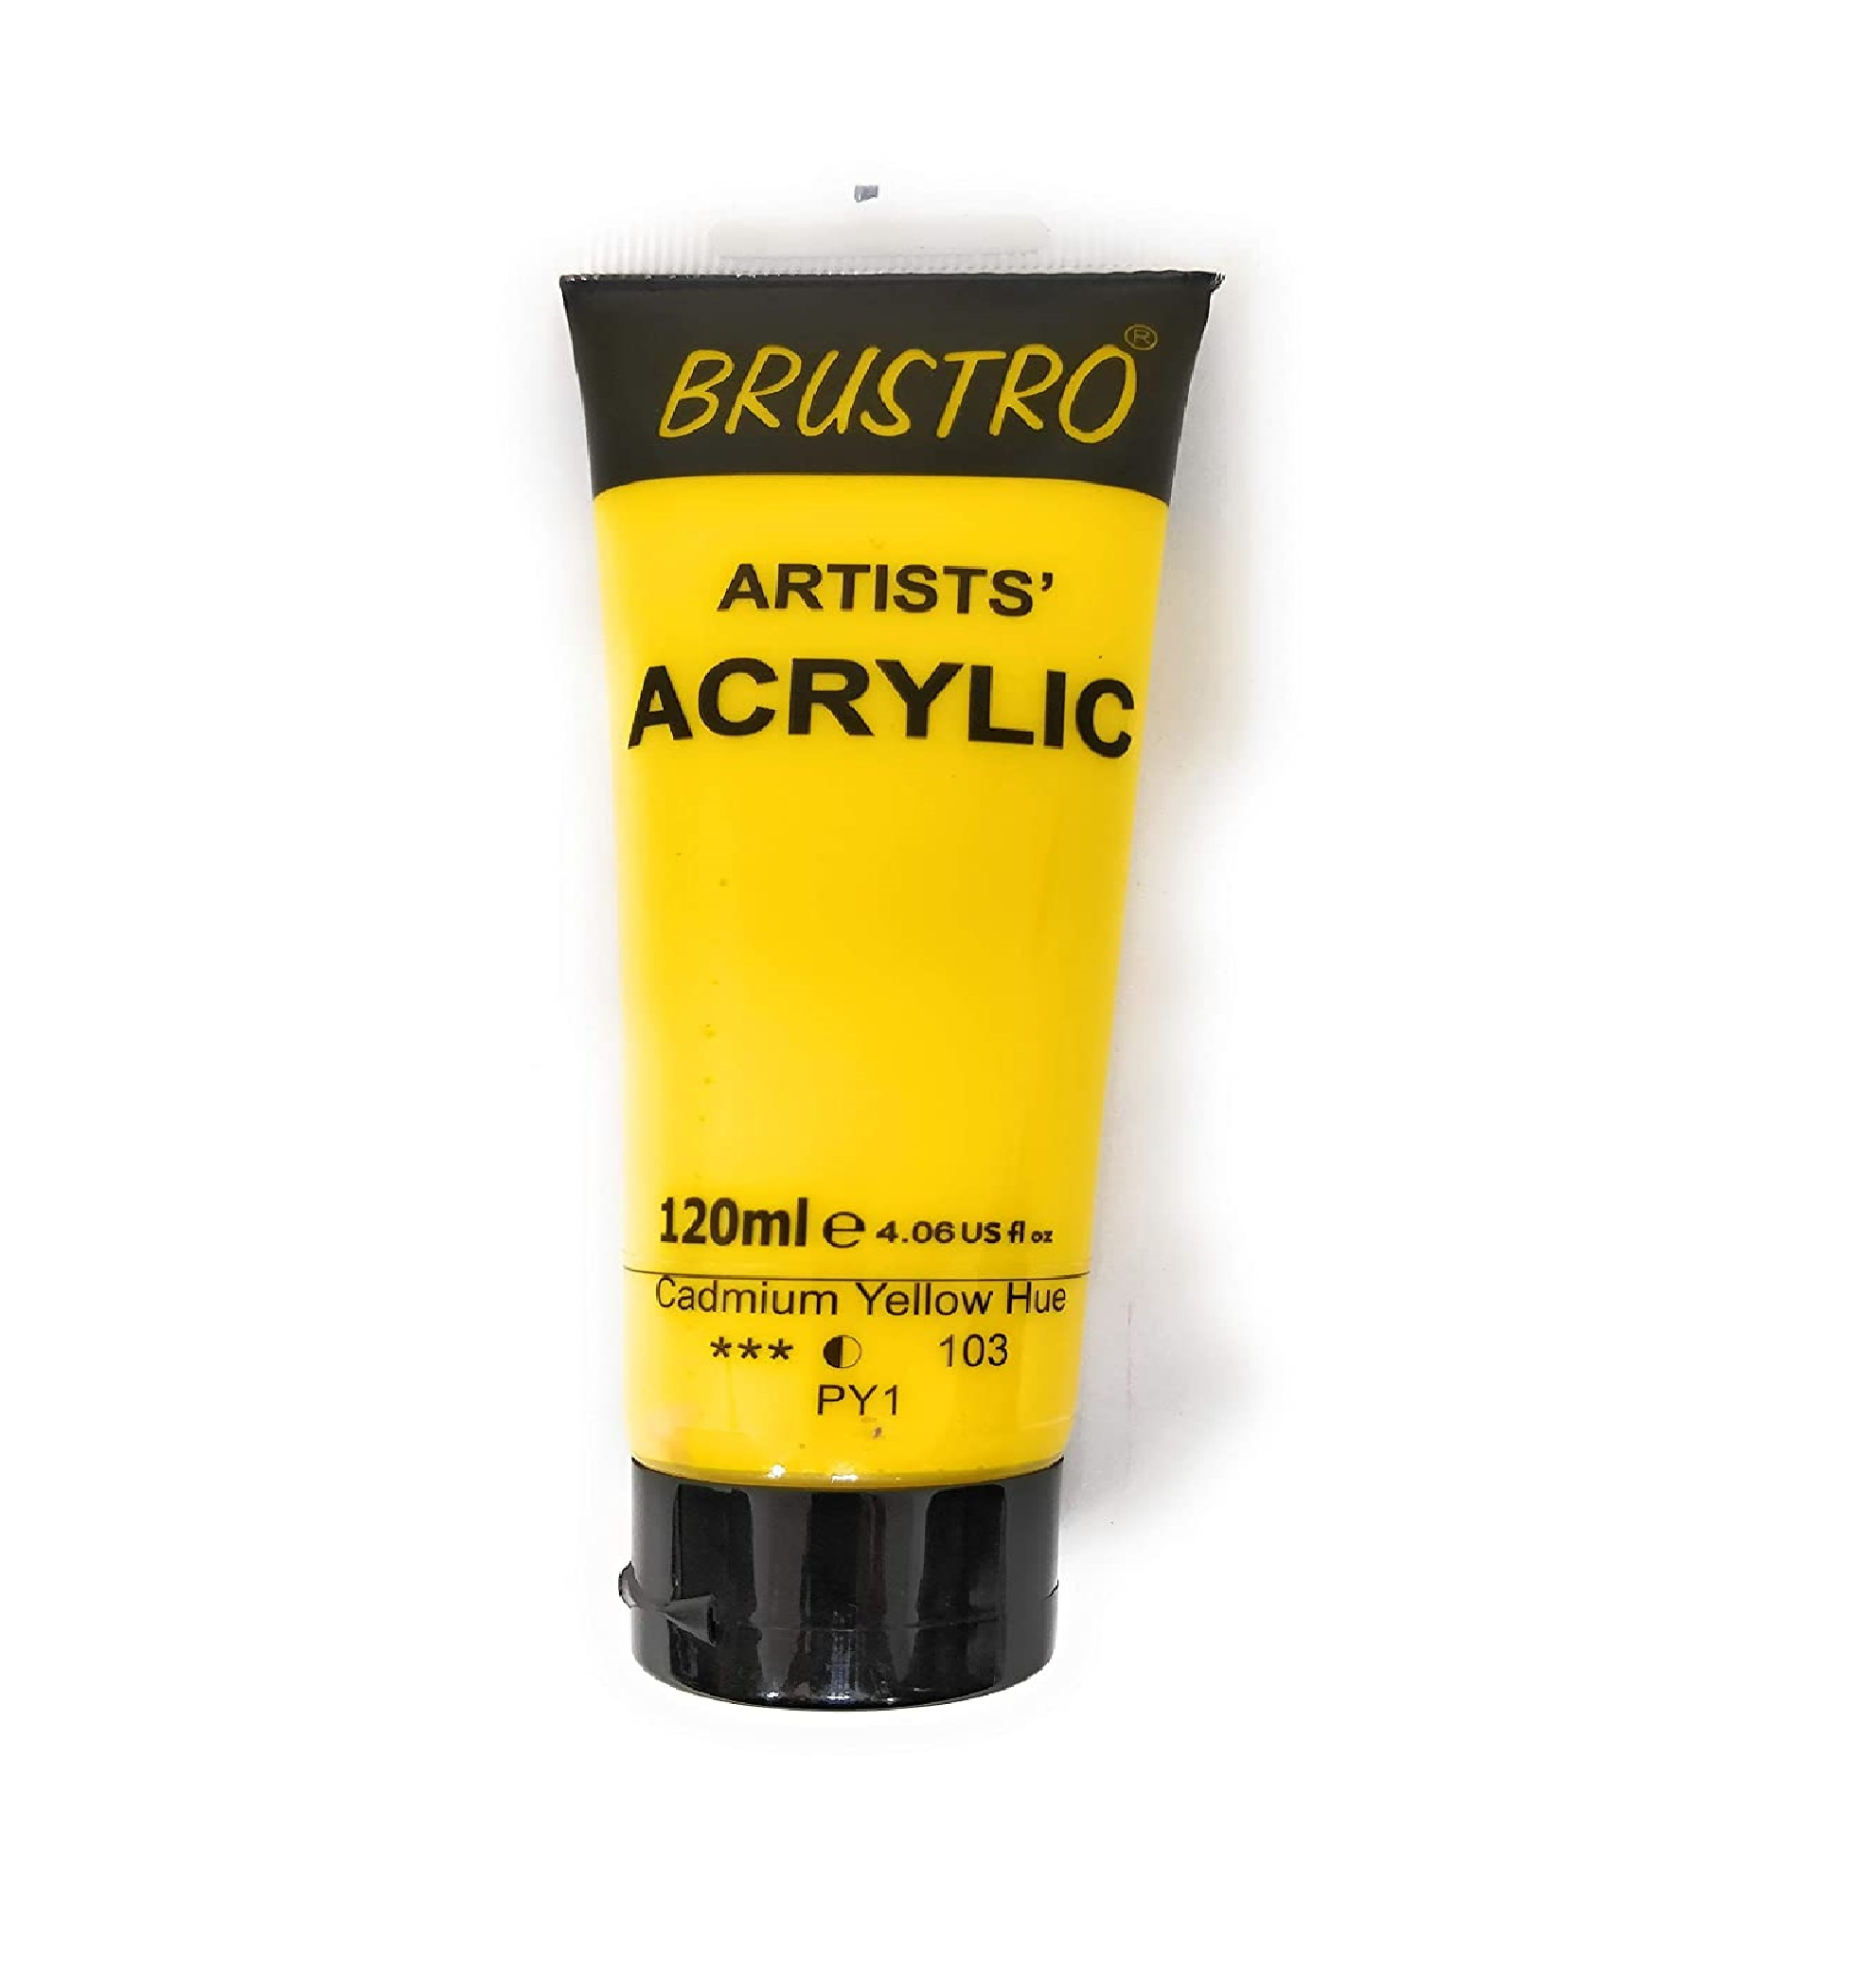 Brustro Artists Acrylic 120ml Cad Yellow Hue